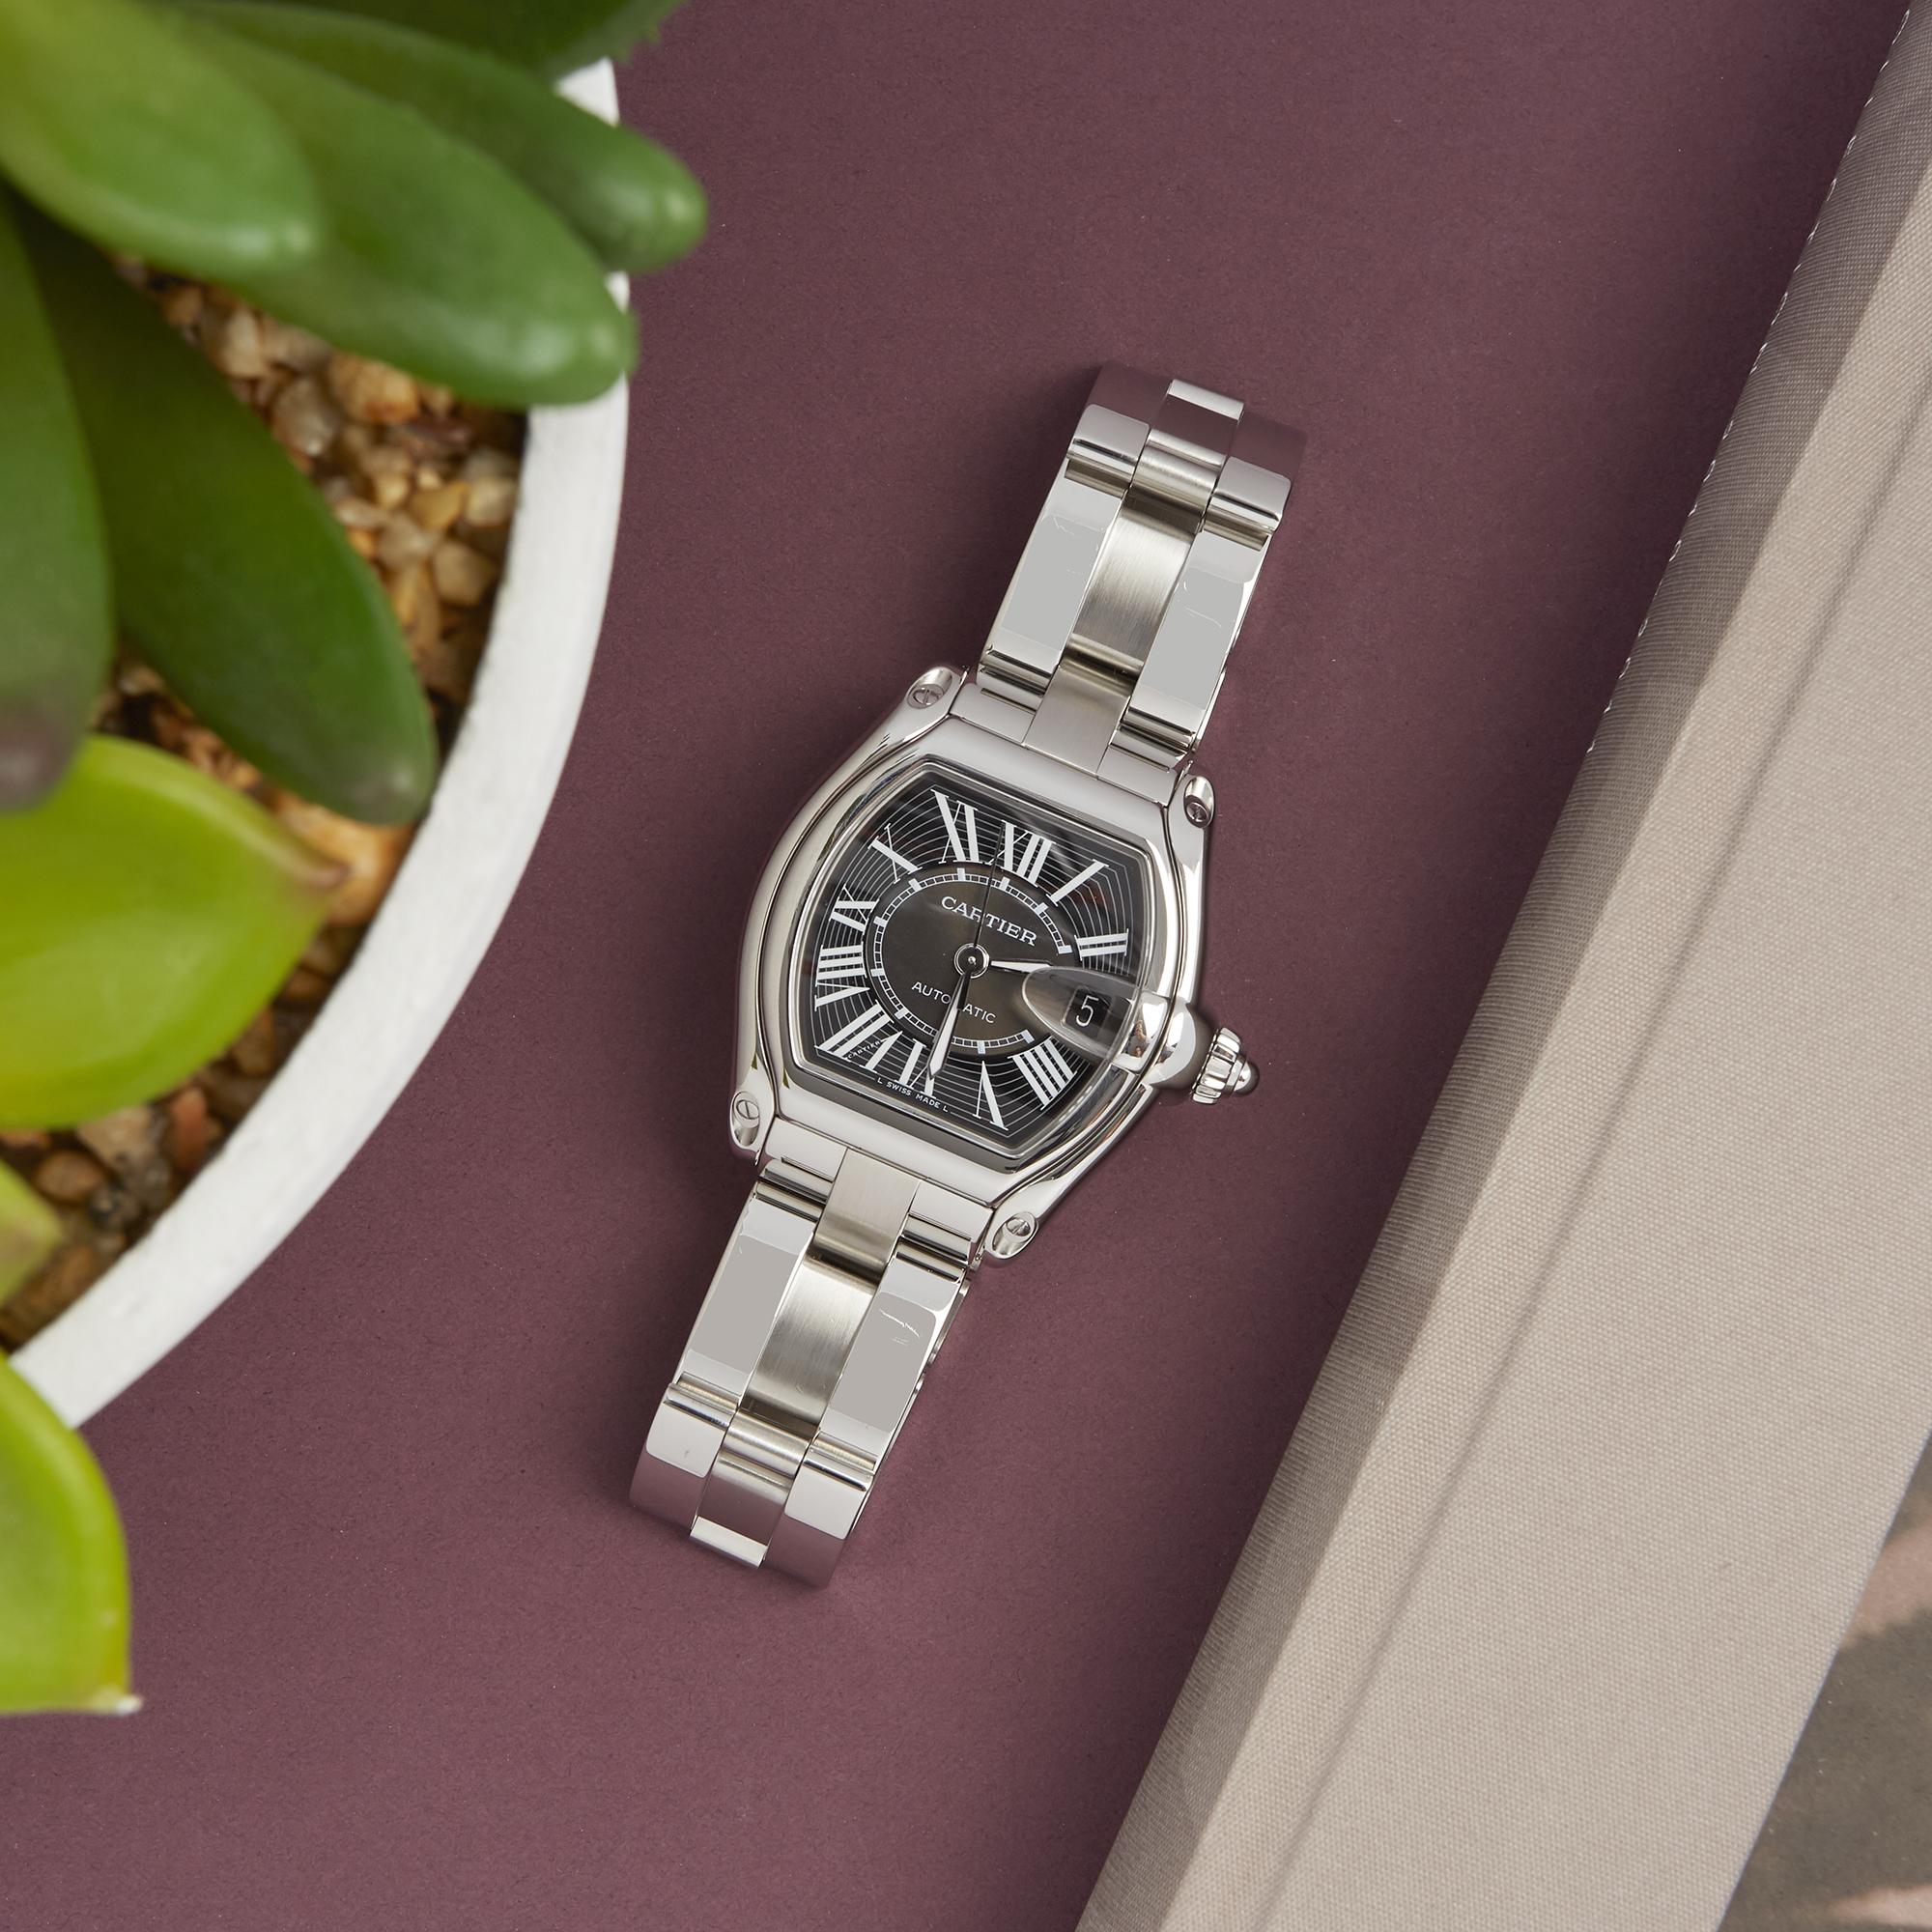 Cartier Roadster 2510 Men Stainless Steel Watch - Image 2 of 8